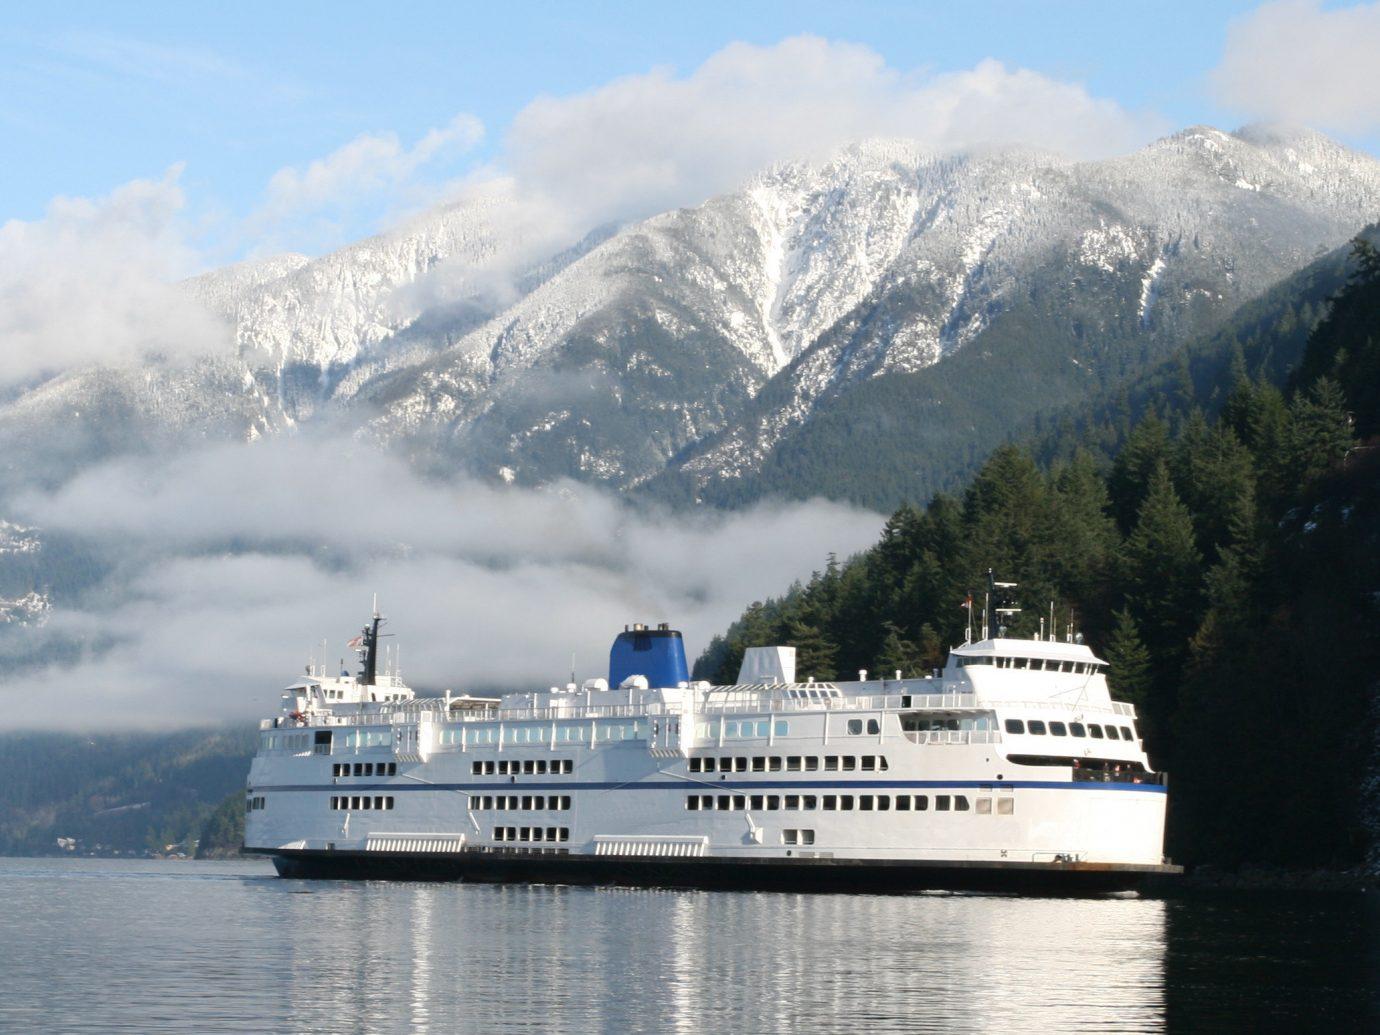 Trip Ideas outdoor sky mountain water vehicle Boat passenger ship cruise ship ship ferry watercraft Sea fjord cargo ship traveling